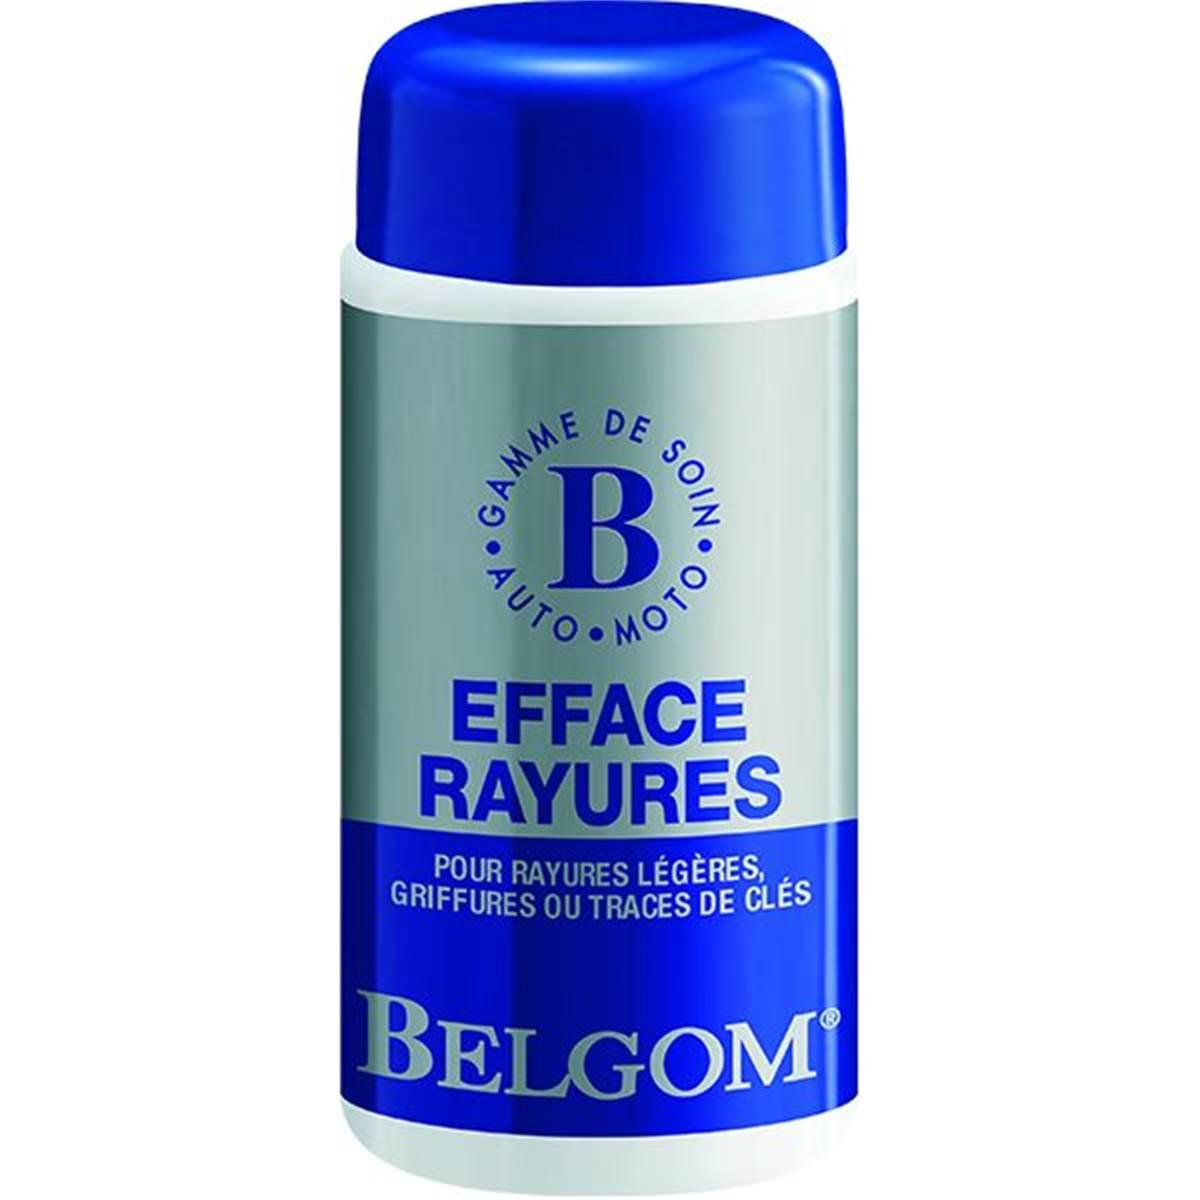 EFFACE RAYURE BELGOM 150 ML